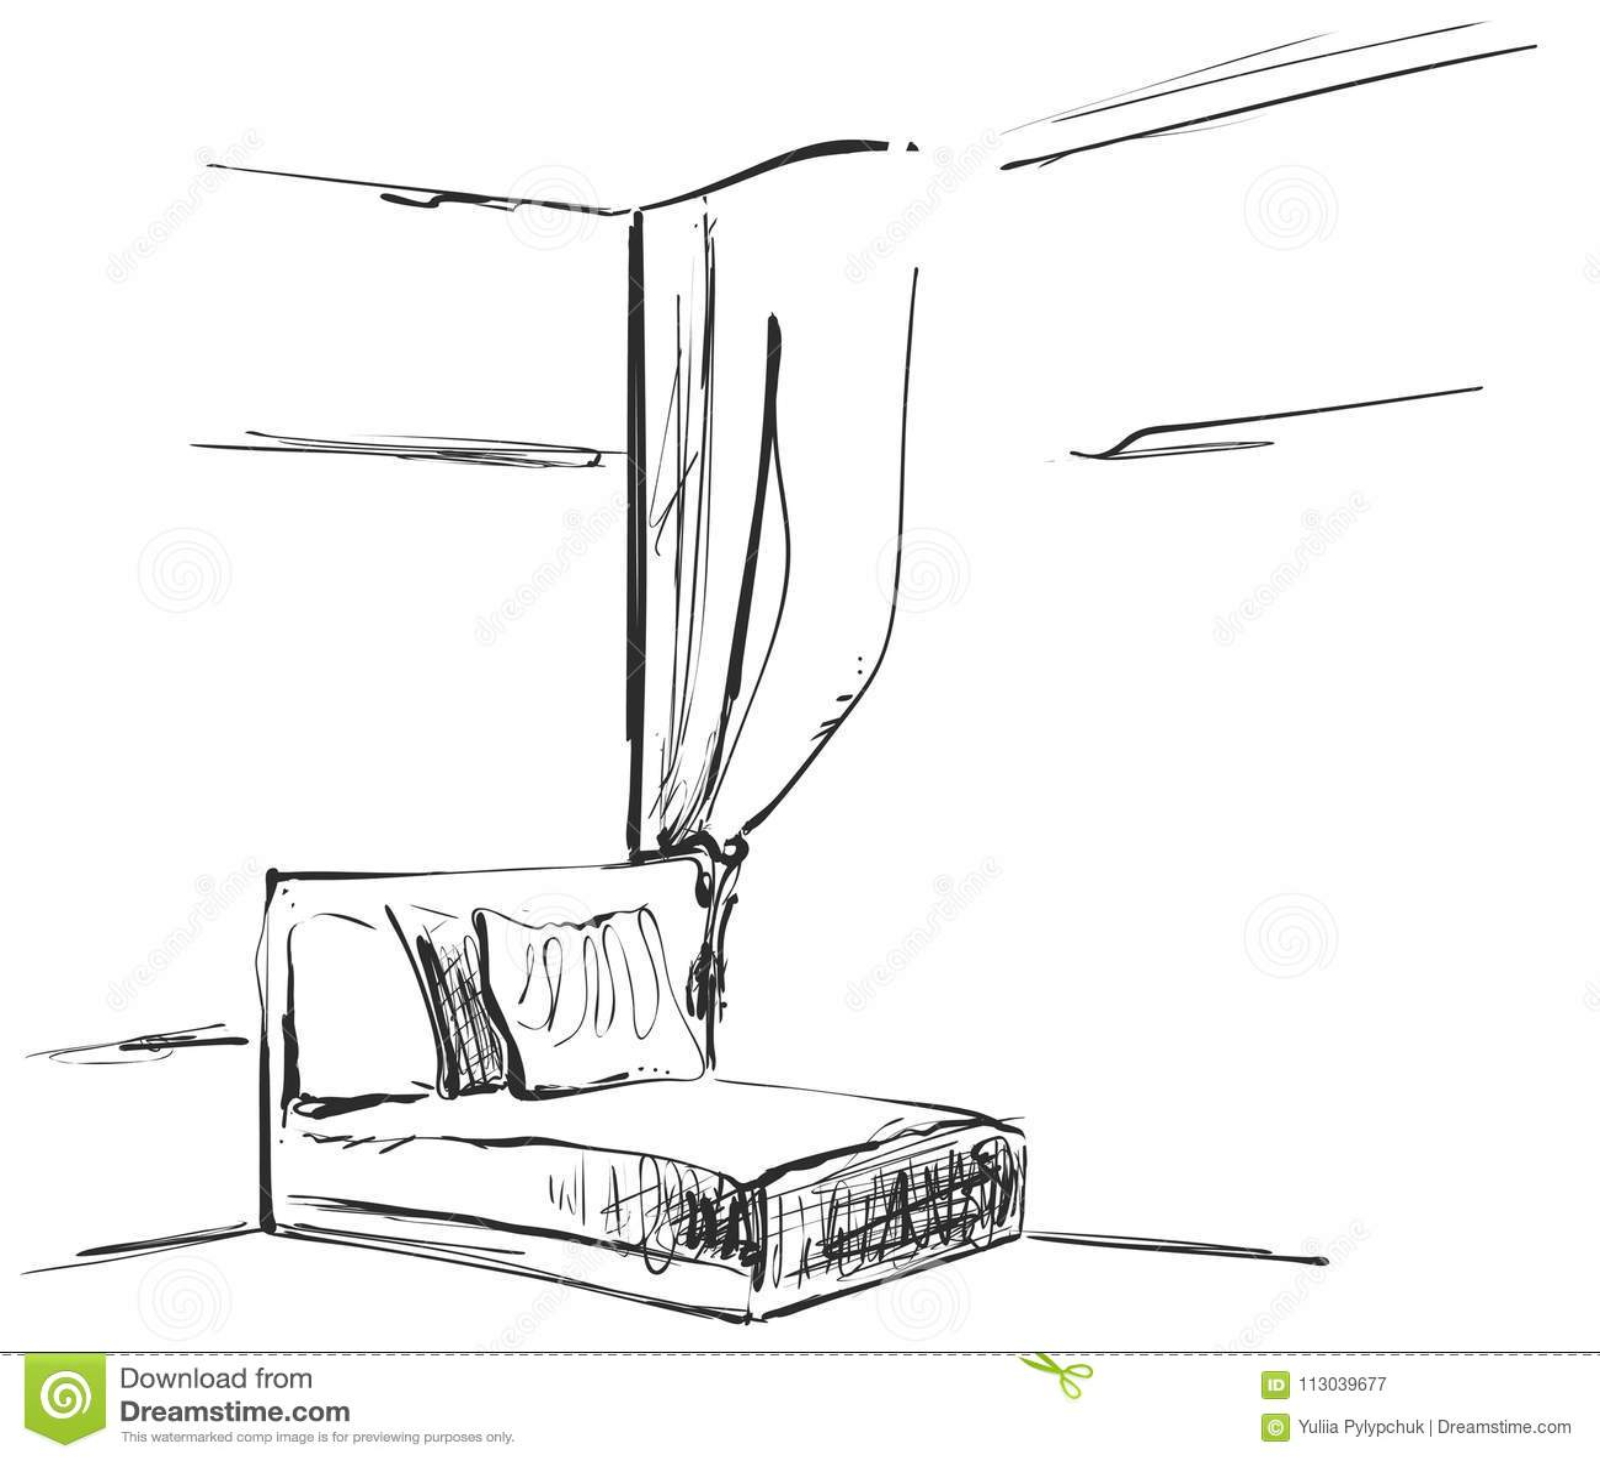 Hand Drawn Room Interior Sketch. Chair, Sofa, Curtains